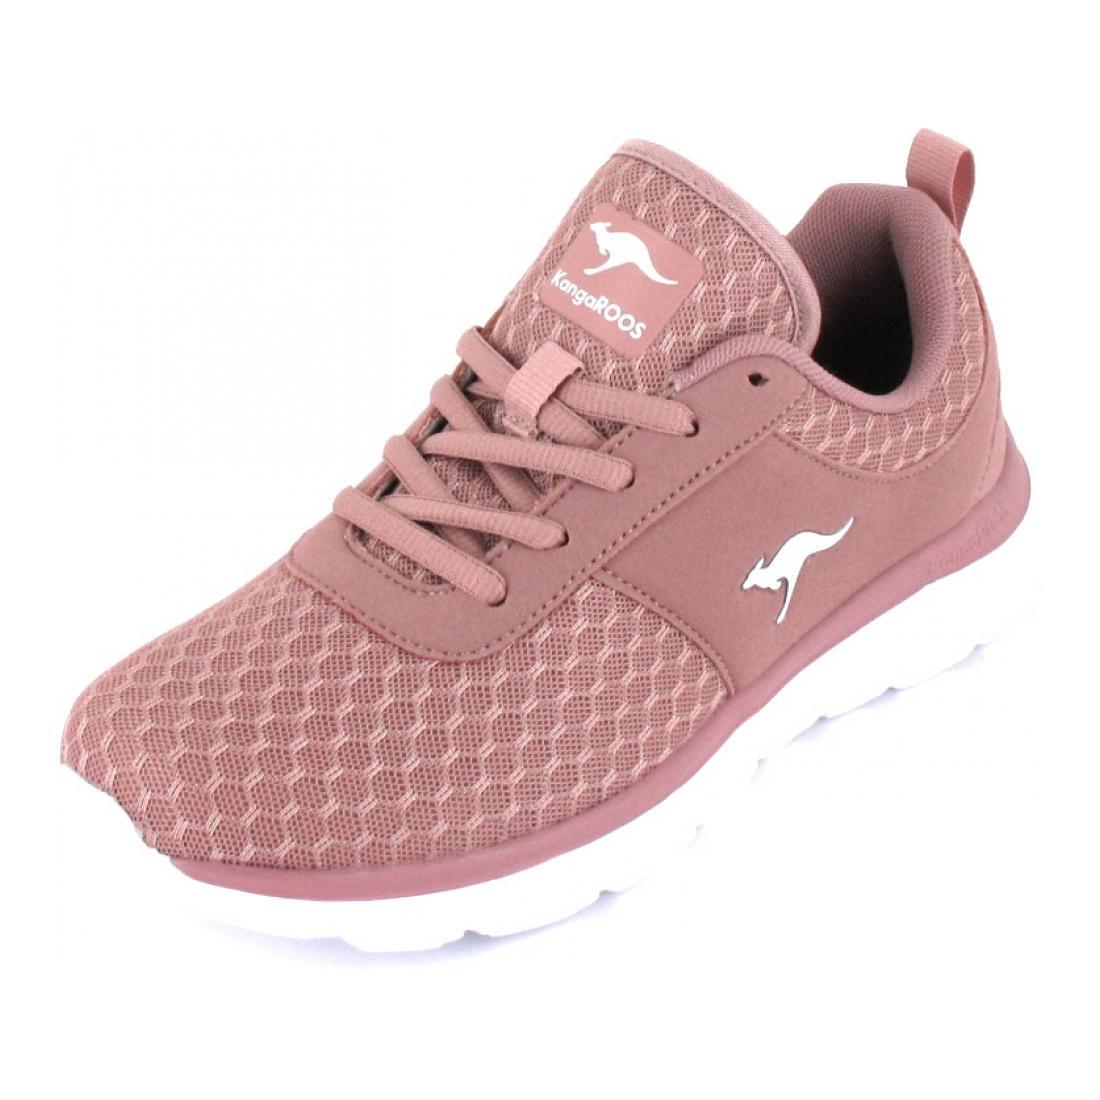 KangaRoos Sneaker KN-Bumpy rose